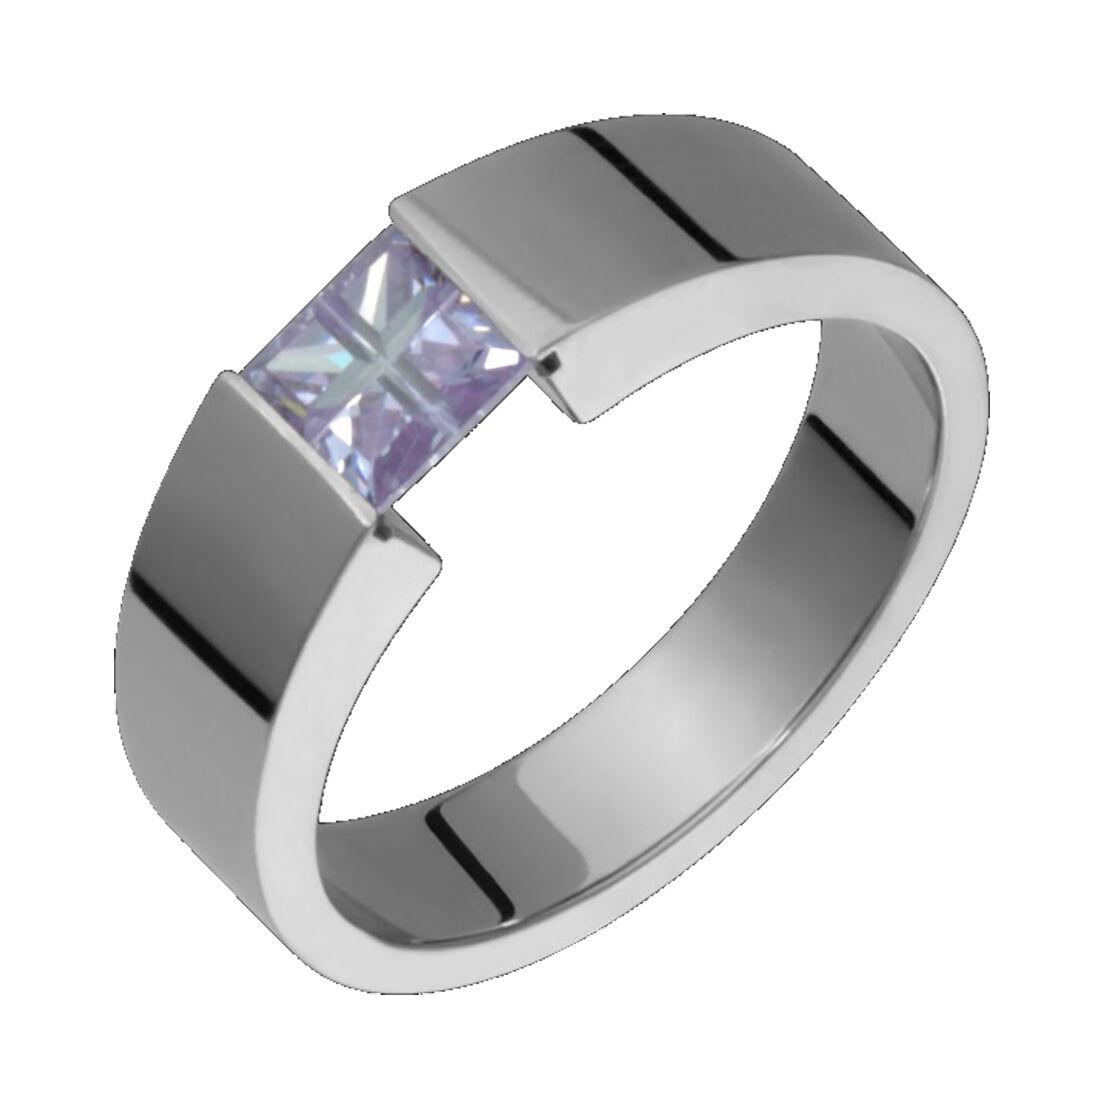 titanium wedding band Titanium Ring Purple Tension Set mm Wide Wedding Band Polished For Him N Her